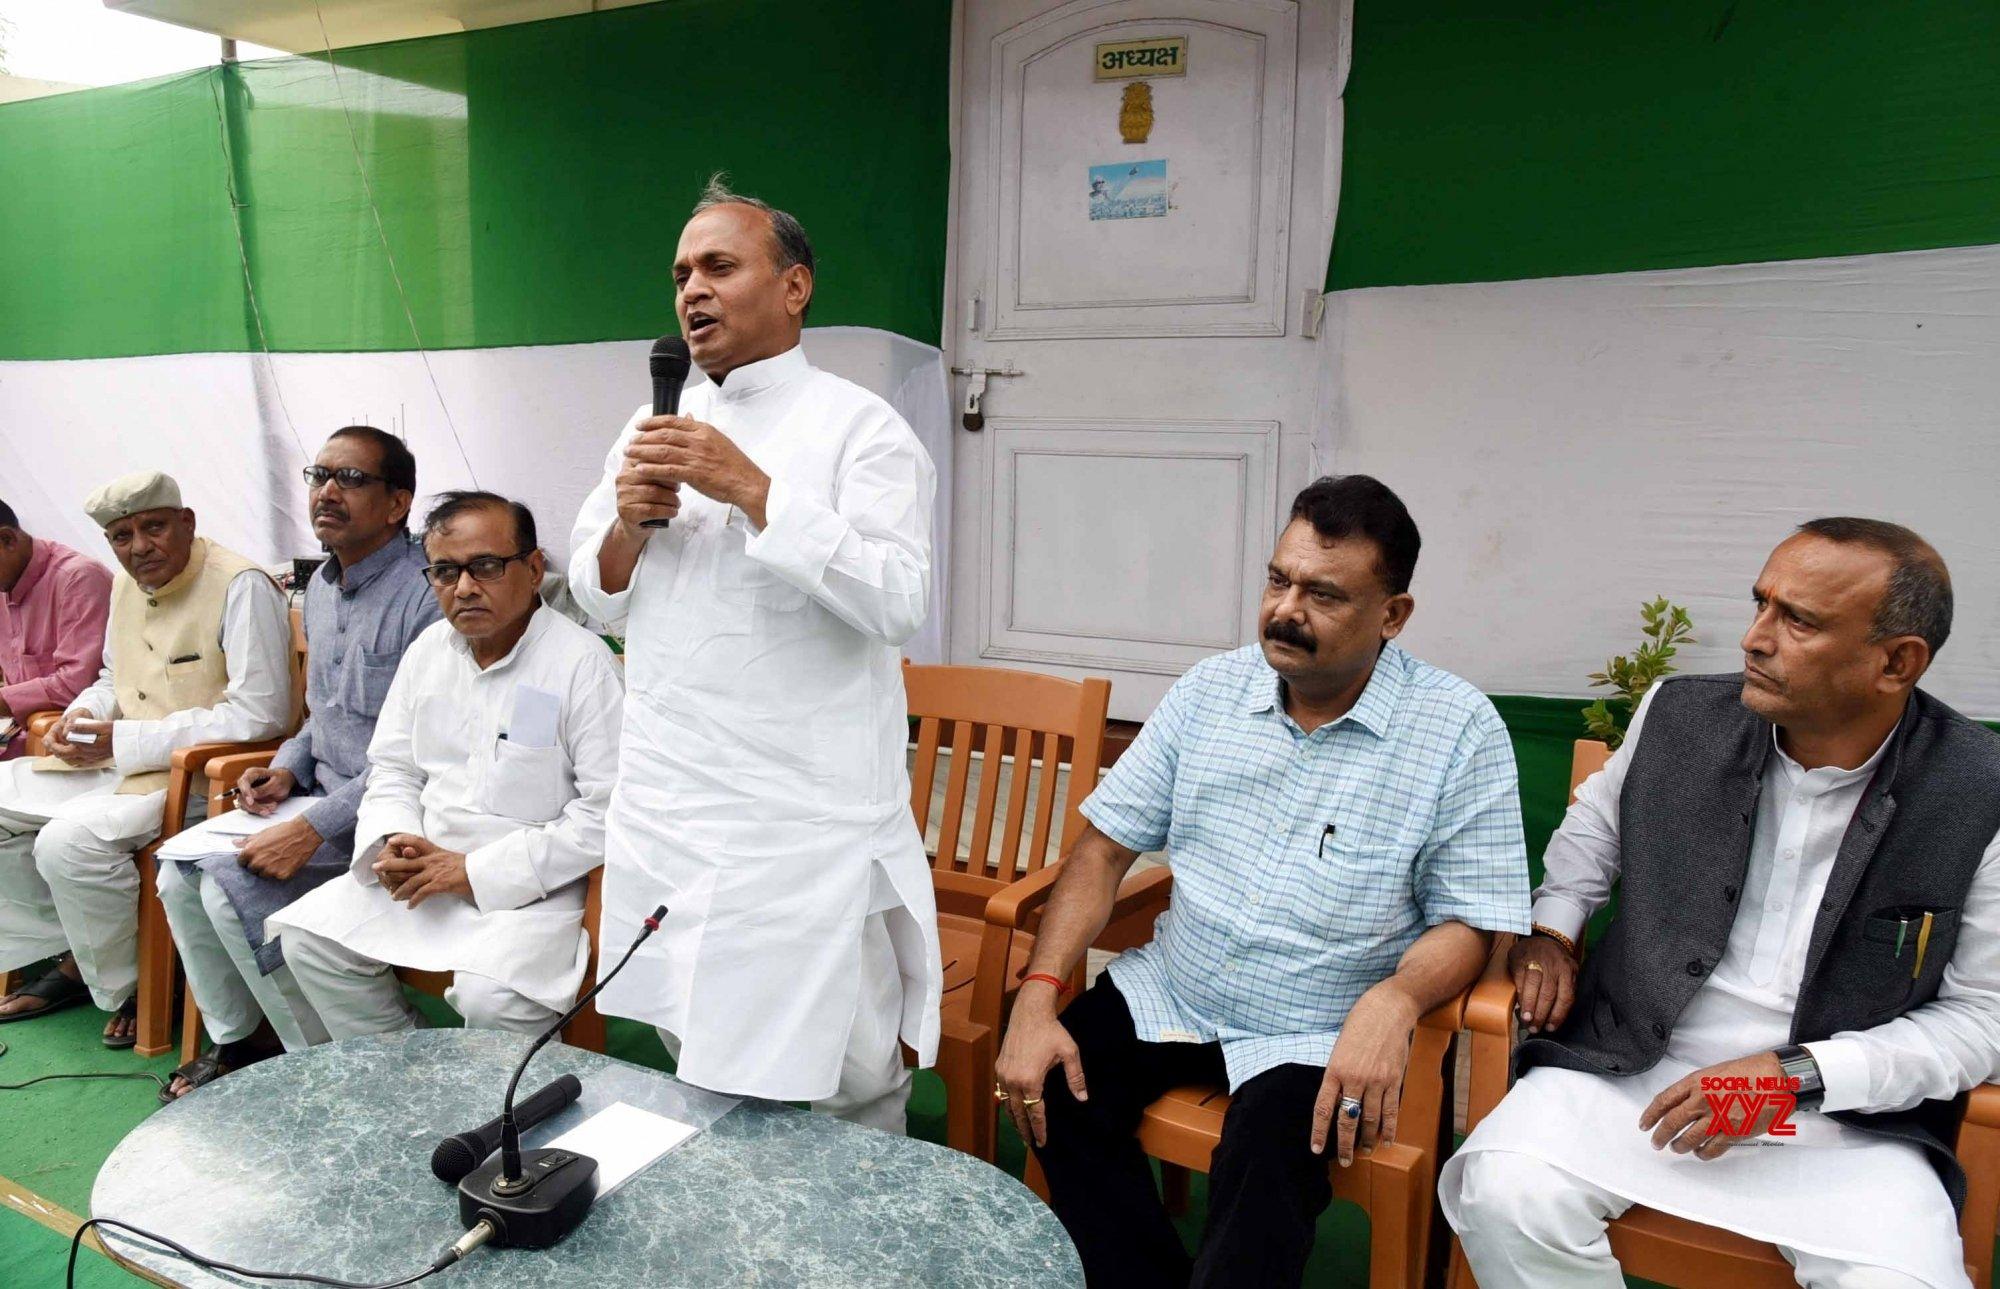 Patna: Ramchandra Prasad Singh at JD - U meeting #Gallery